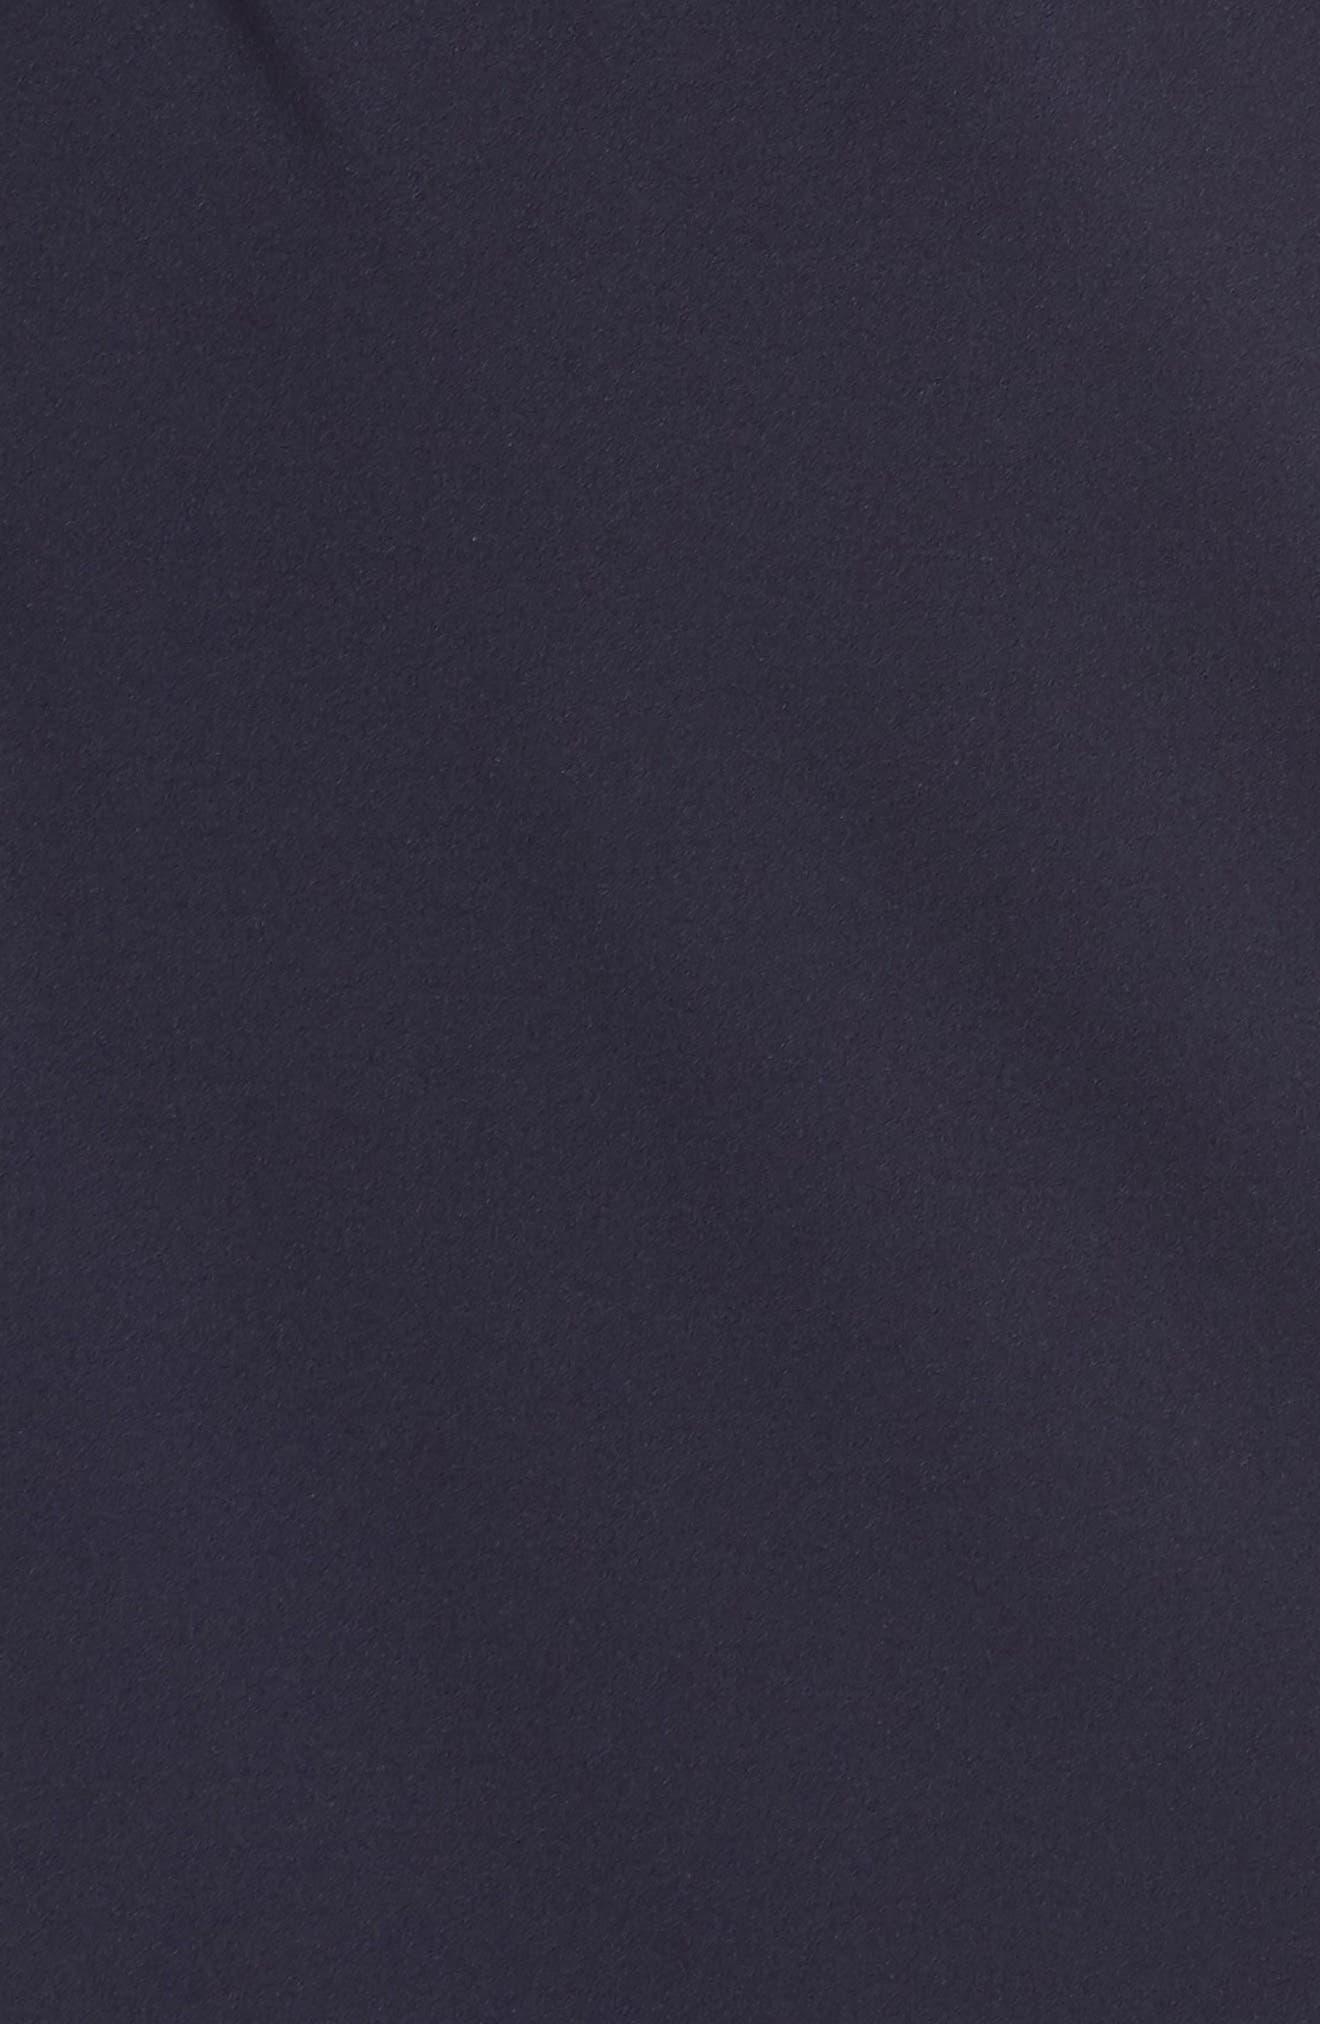 One-Shoulder Sheath Dress,                             Alternate thumbnail 5, color,